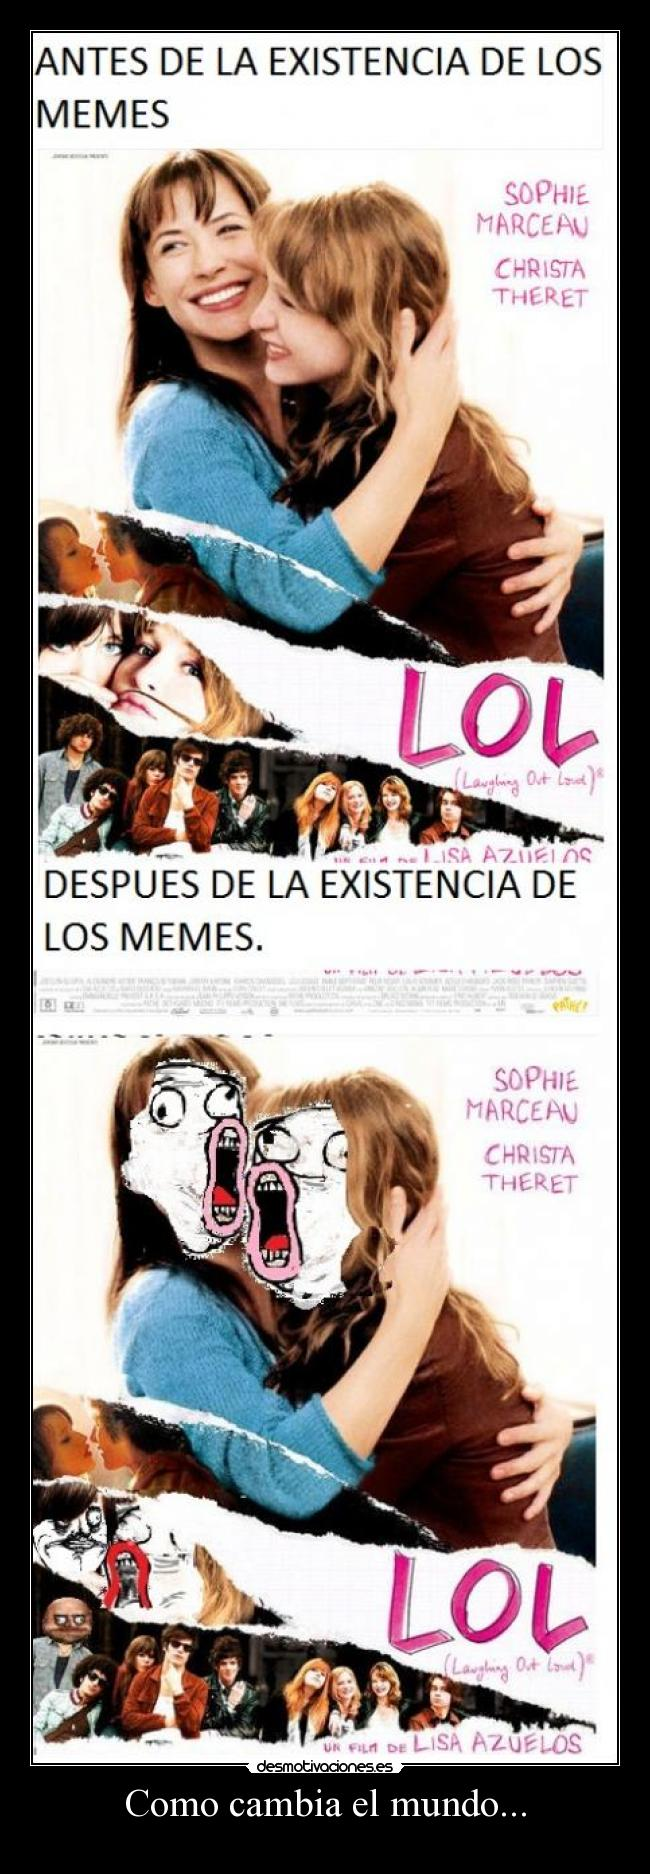 carteles mundo memes lol pelicula lol mas lol paint editar porno xxx mayores edad amateurs desmotivaciones